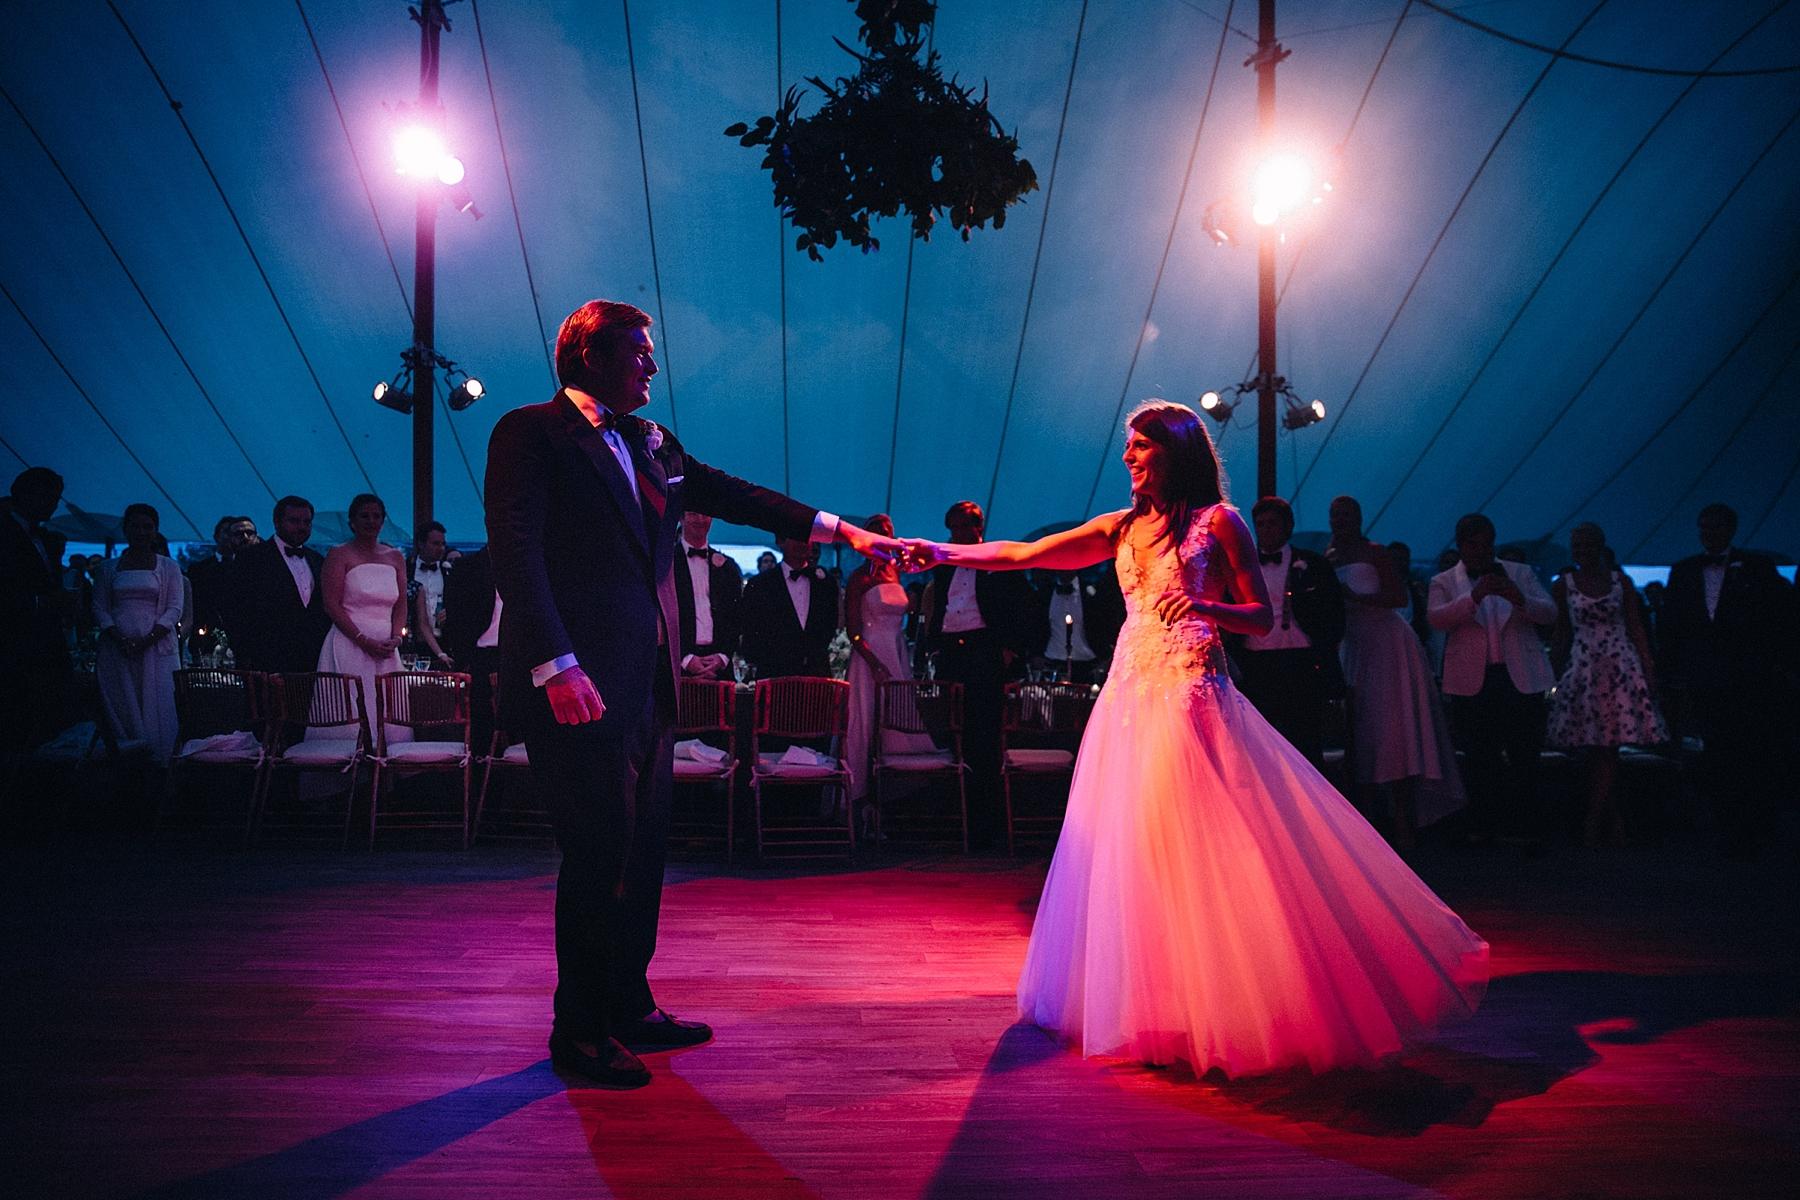 mashomack-preserve-polo-club-wedding-ny-photographer_0079.jpg